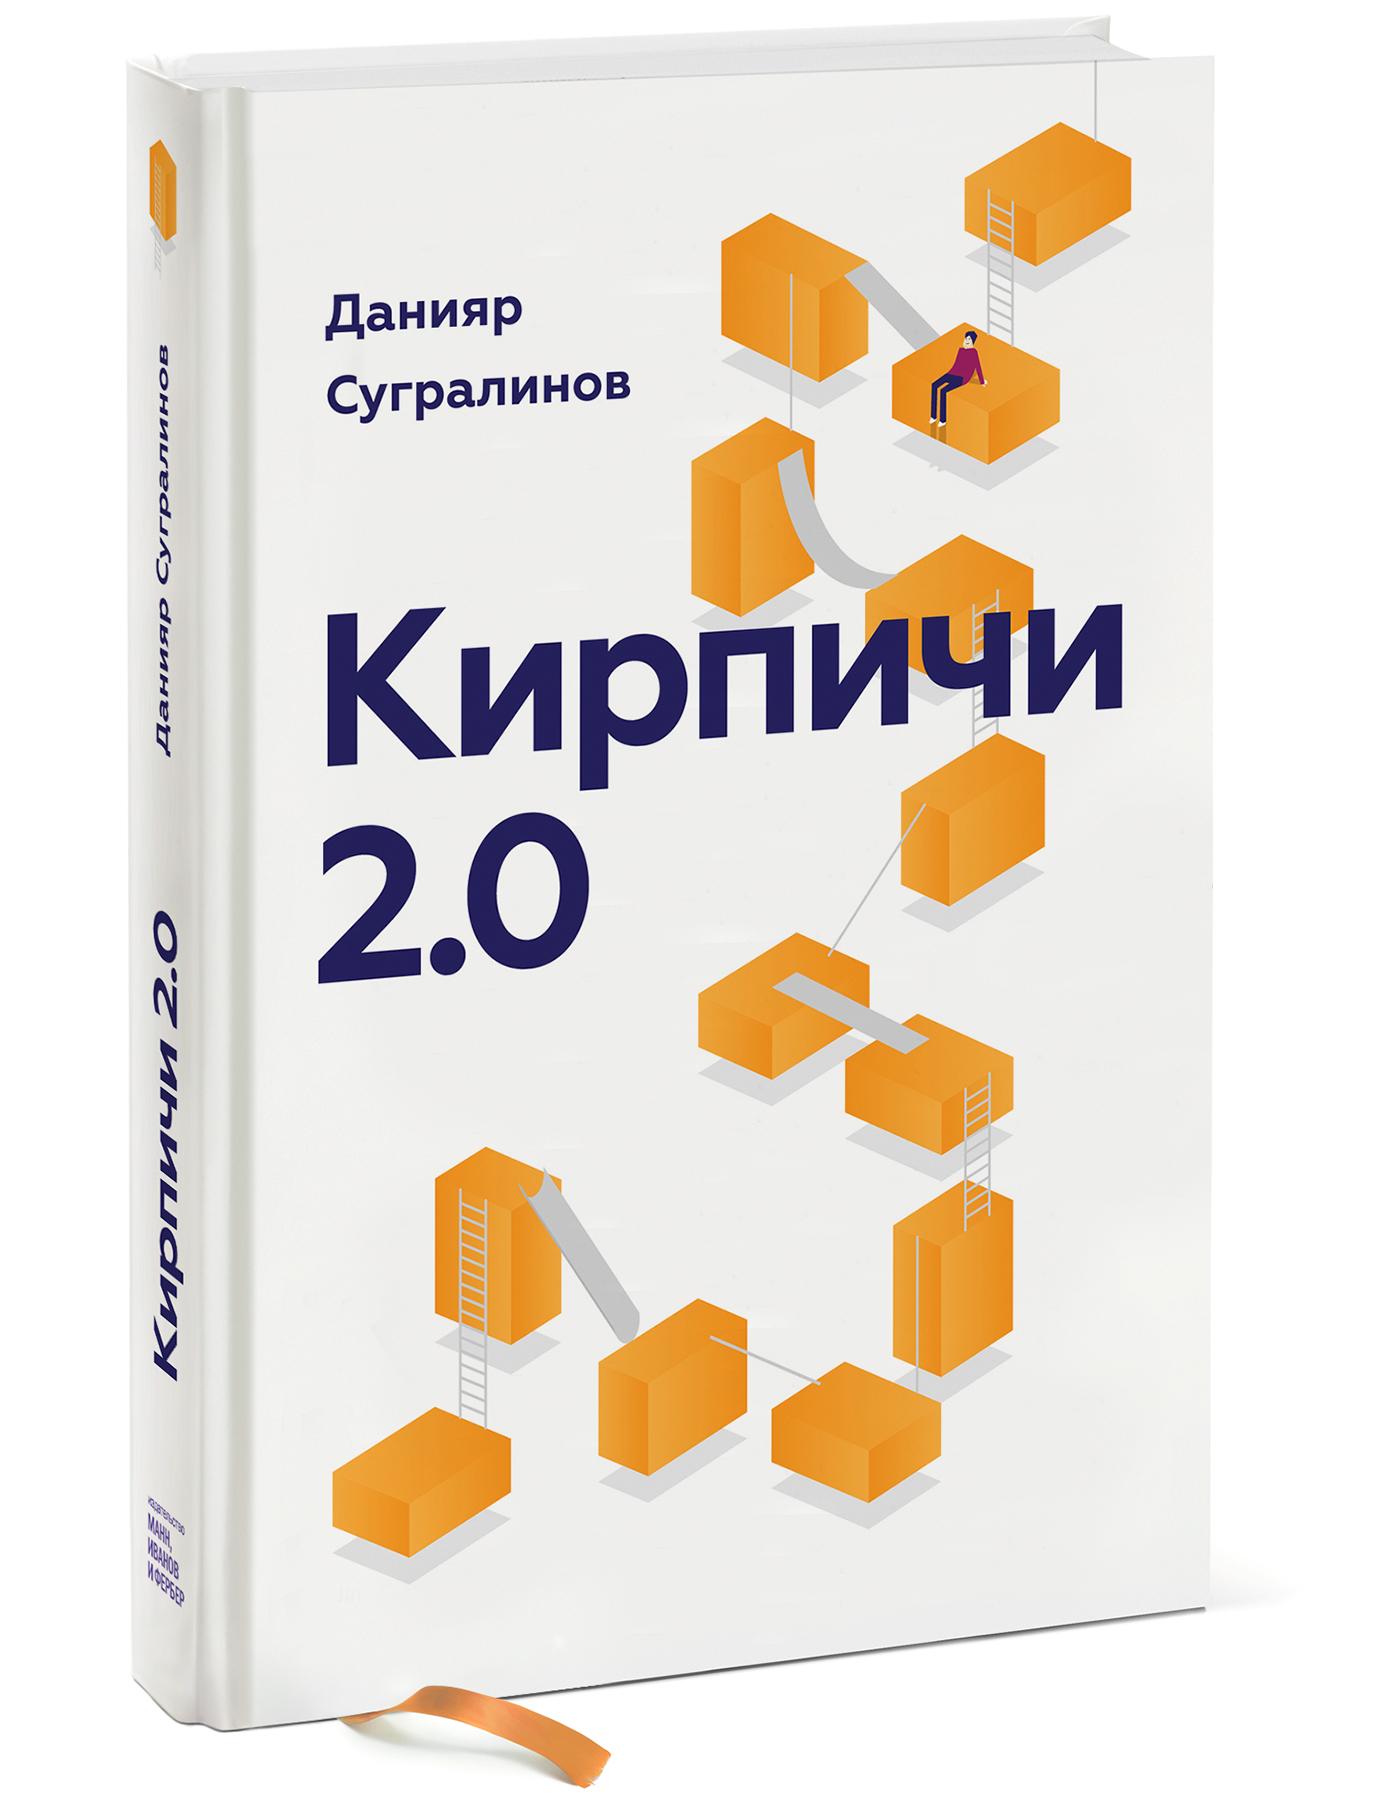 Кирпичи 2. 0